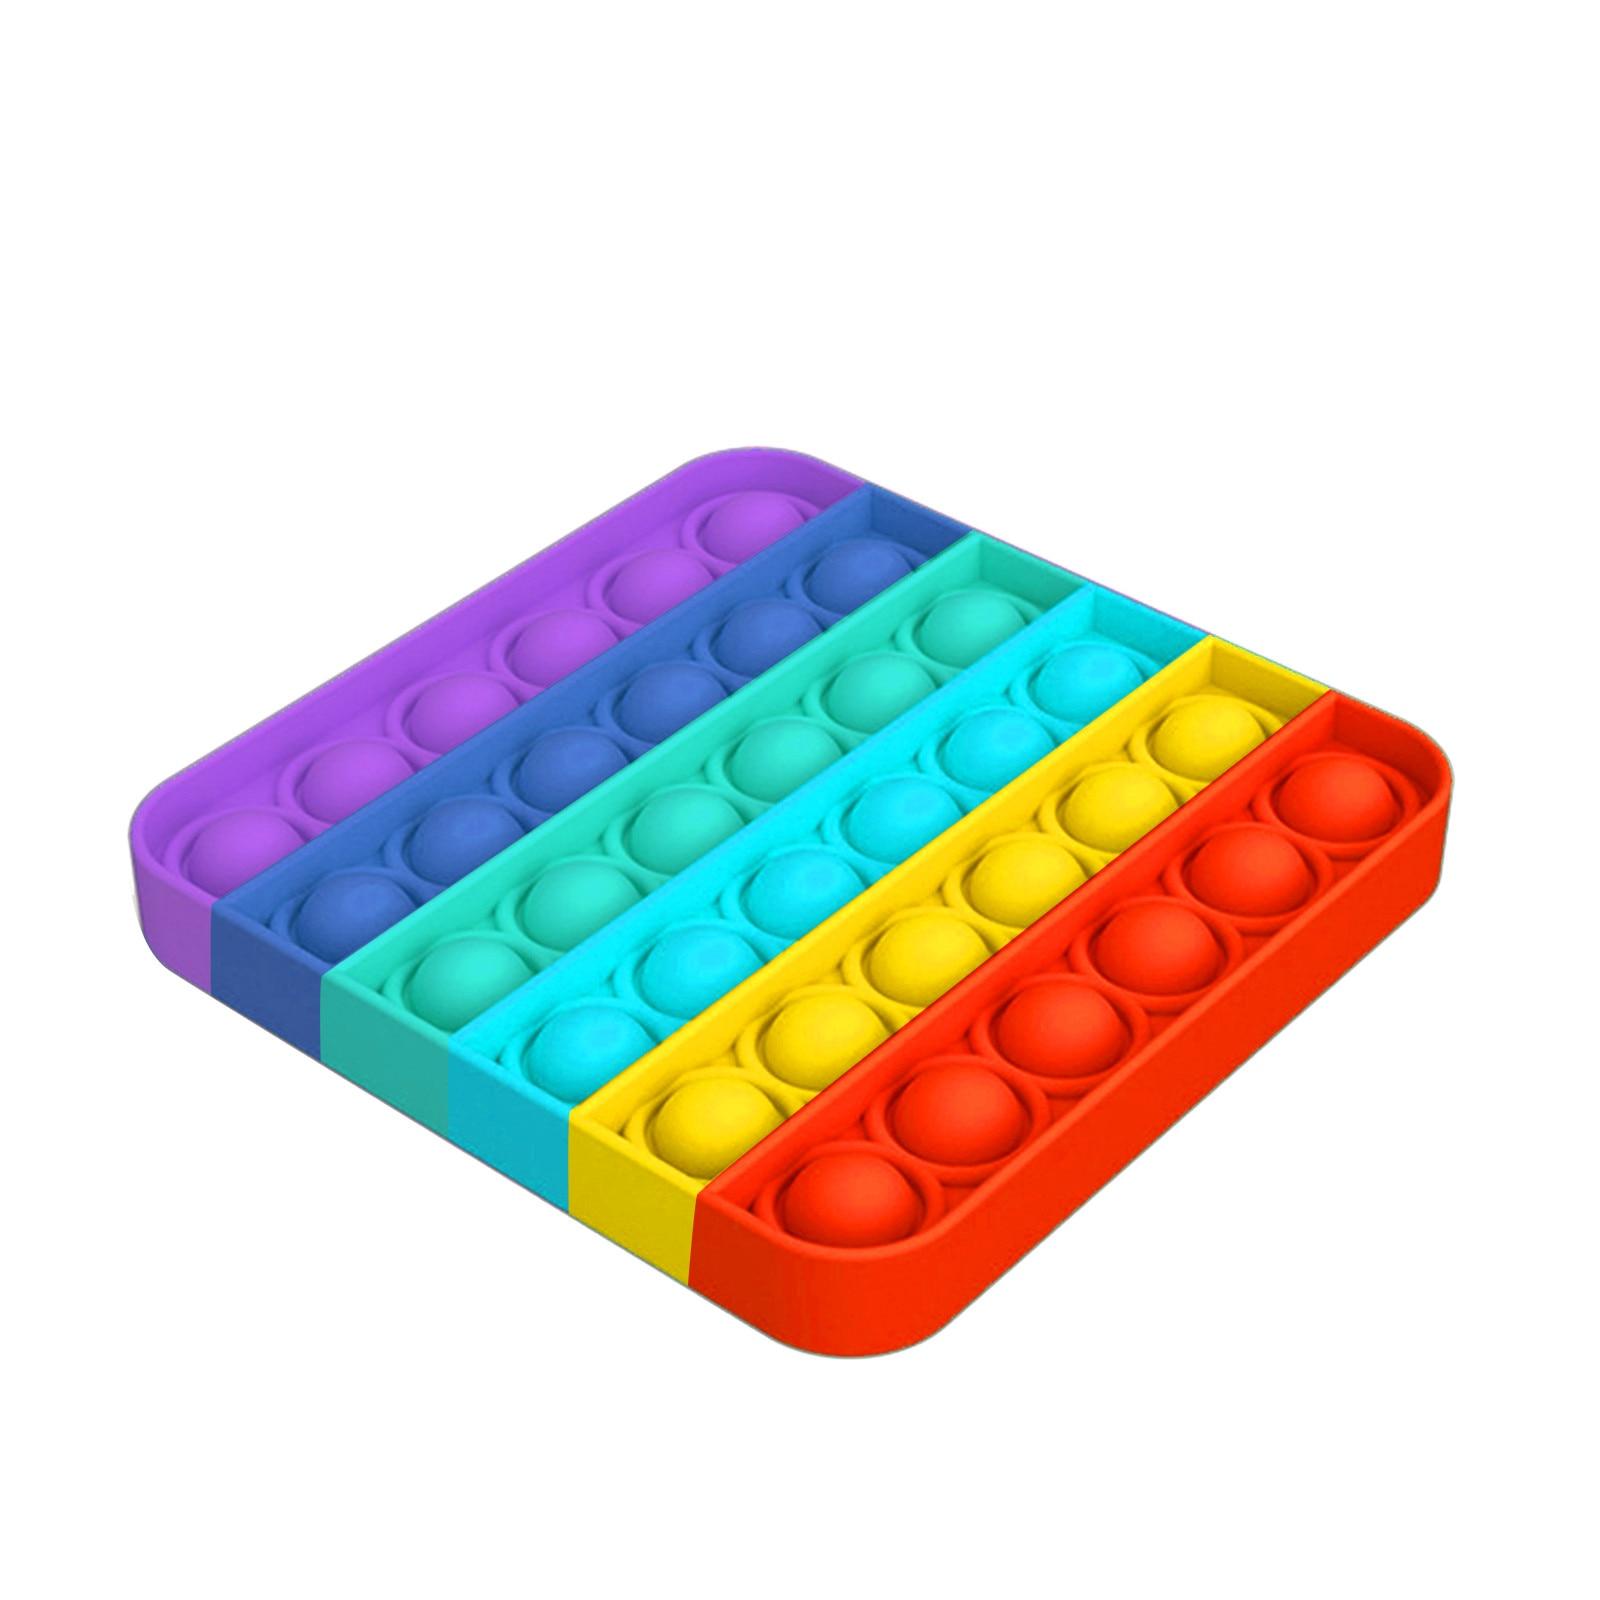 Fitget-Toys Sensory-Toy Autism Fidget Needs-Stress Pop-It-Game Push Bubble Reliever Popoit img4